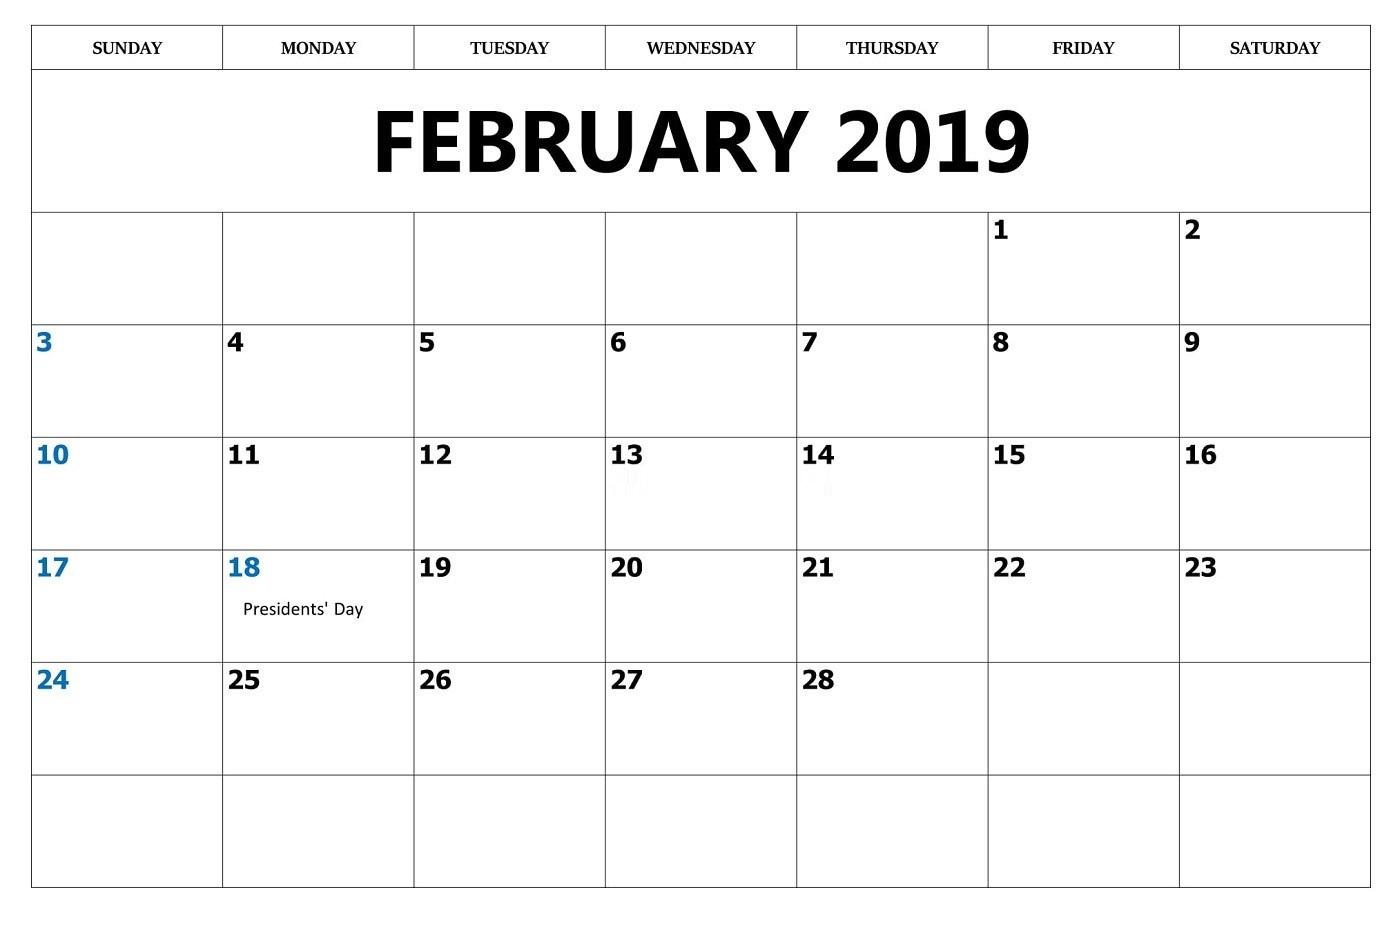 February 2019 Calendar South Africa With Holidays